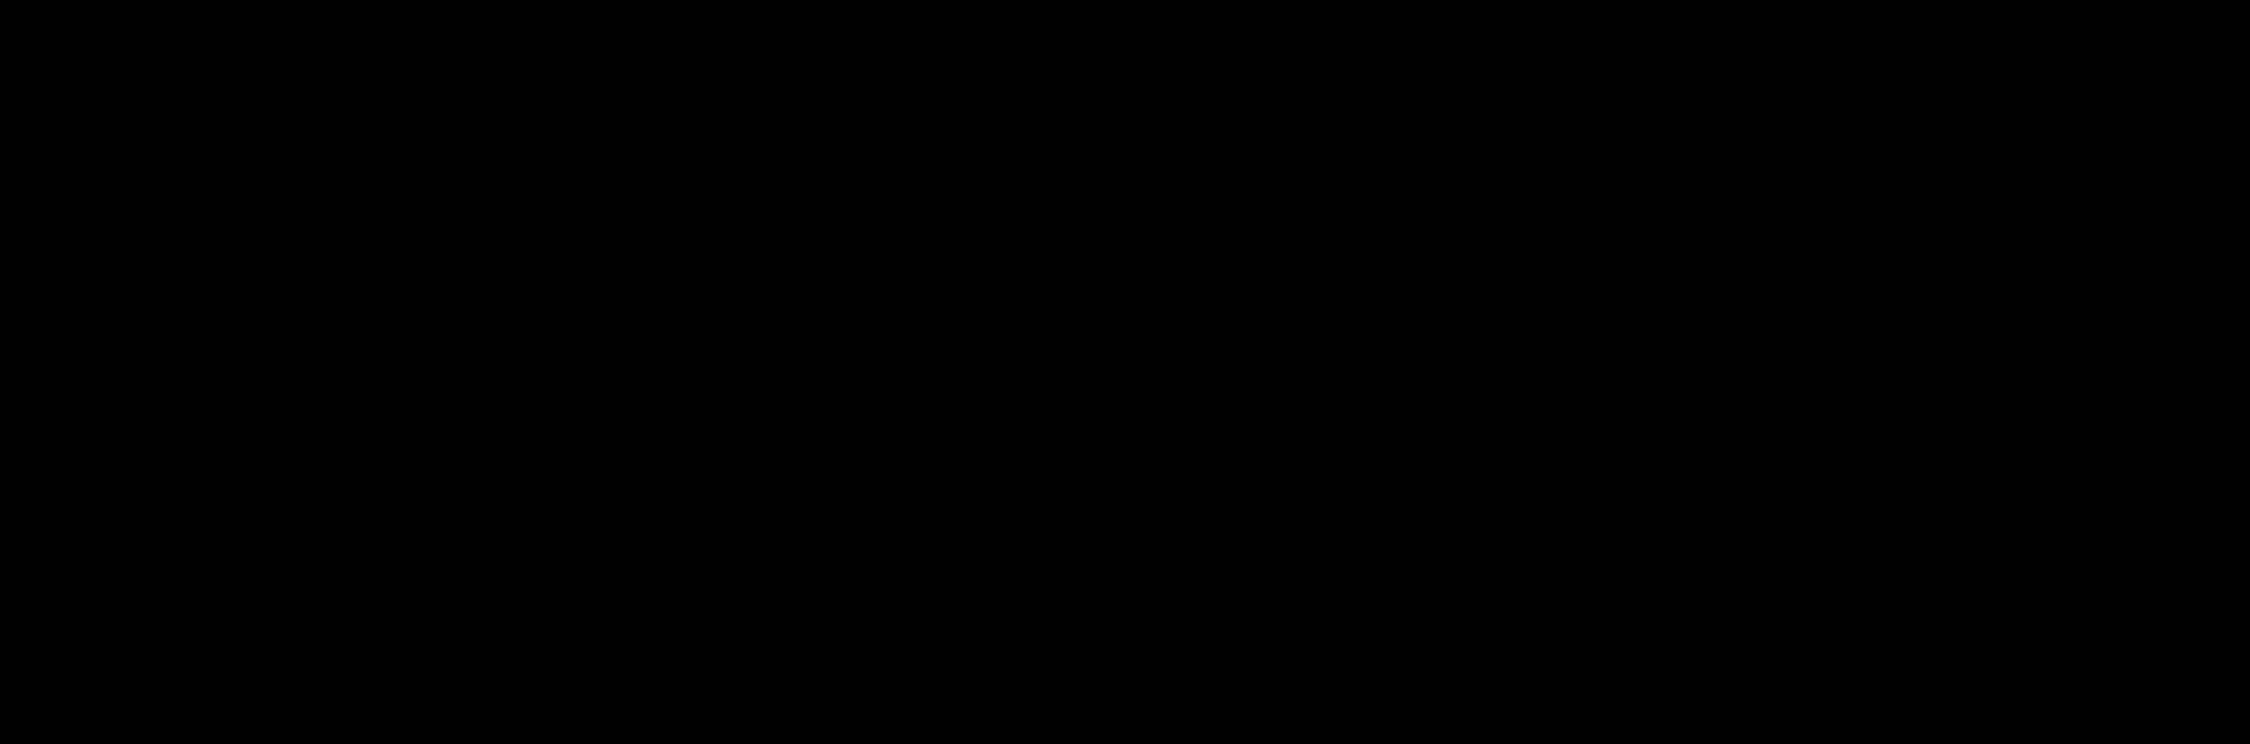 Skeleton Key Silhouette-Skeleton Key Silhouette-7